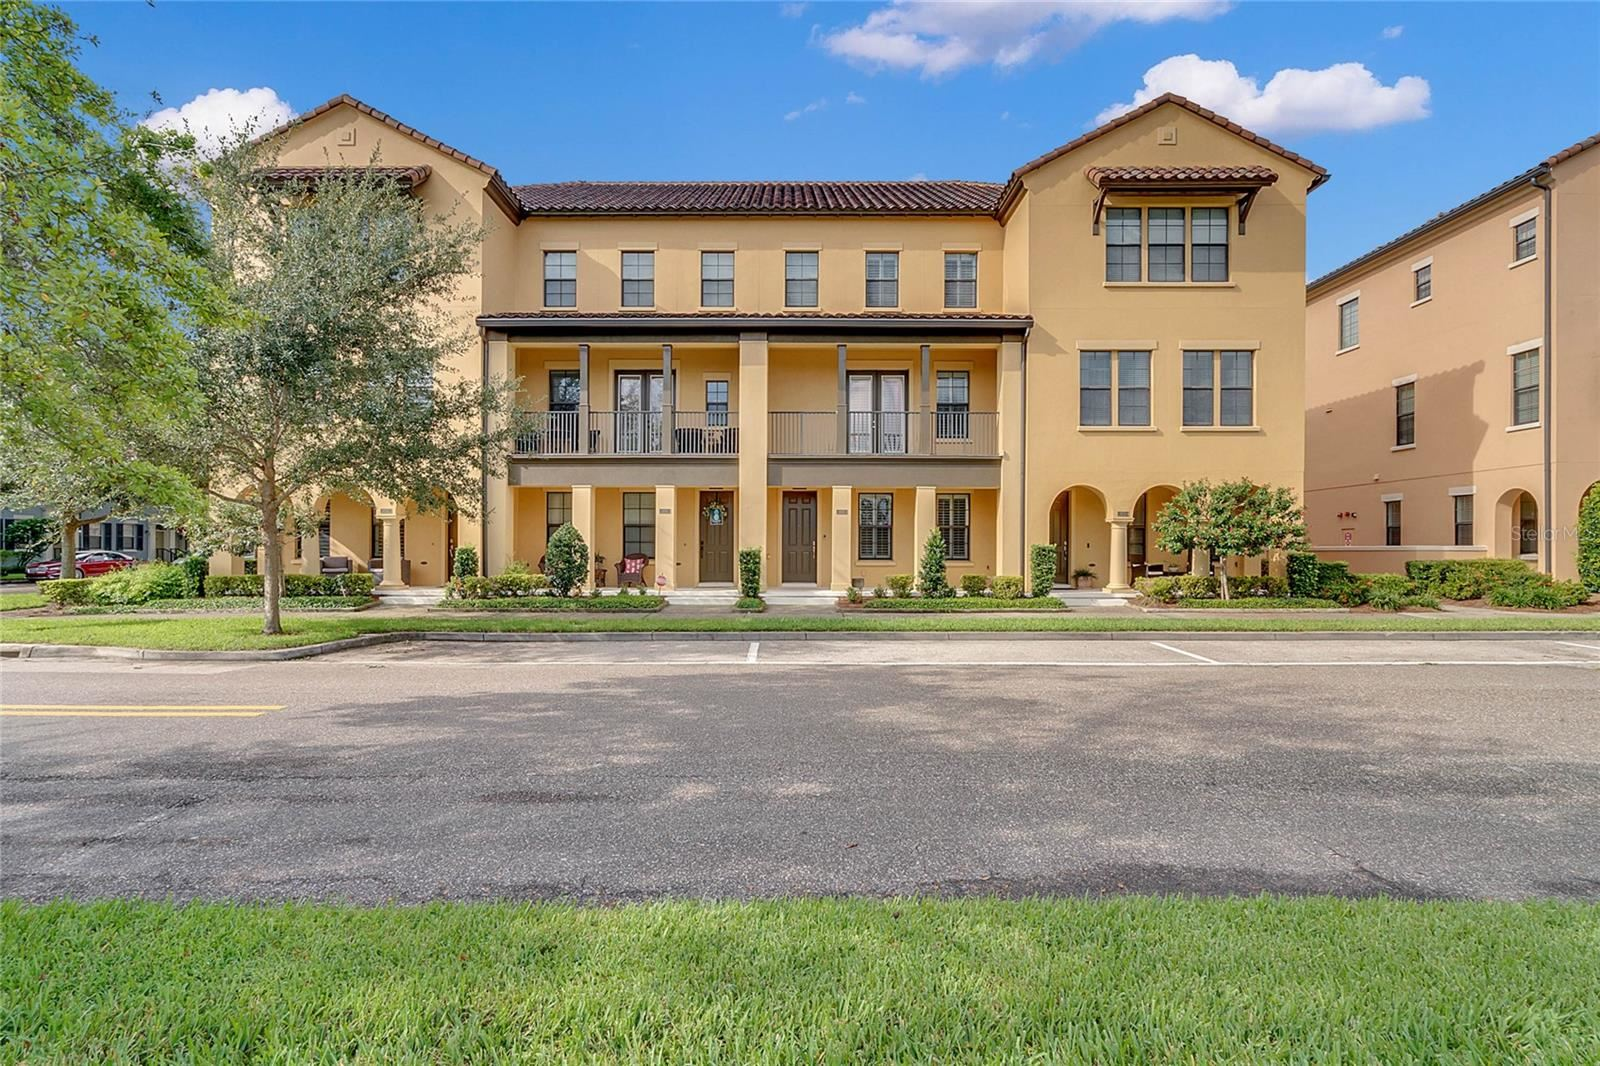 1816 PROSPECT AVENUE, Orlando, FL 32814 - #: O5973909